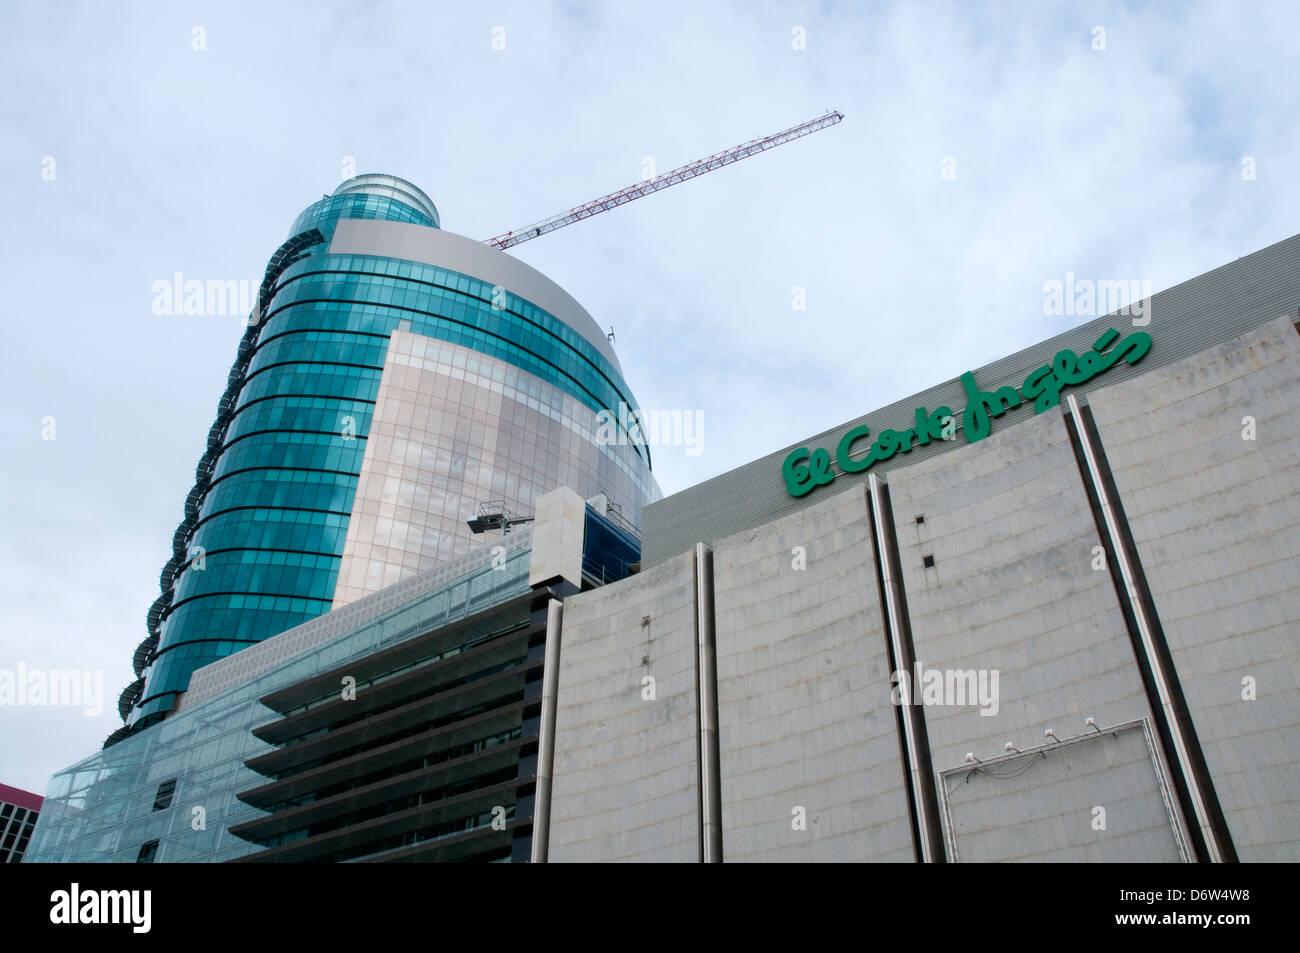 Titania Turm, El Corte Ingles. AZCA, Madrid, Spanien. Stockbild